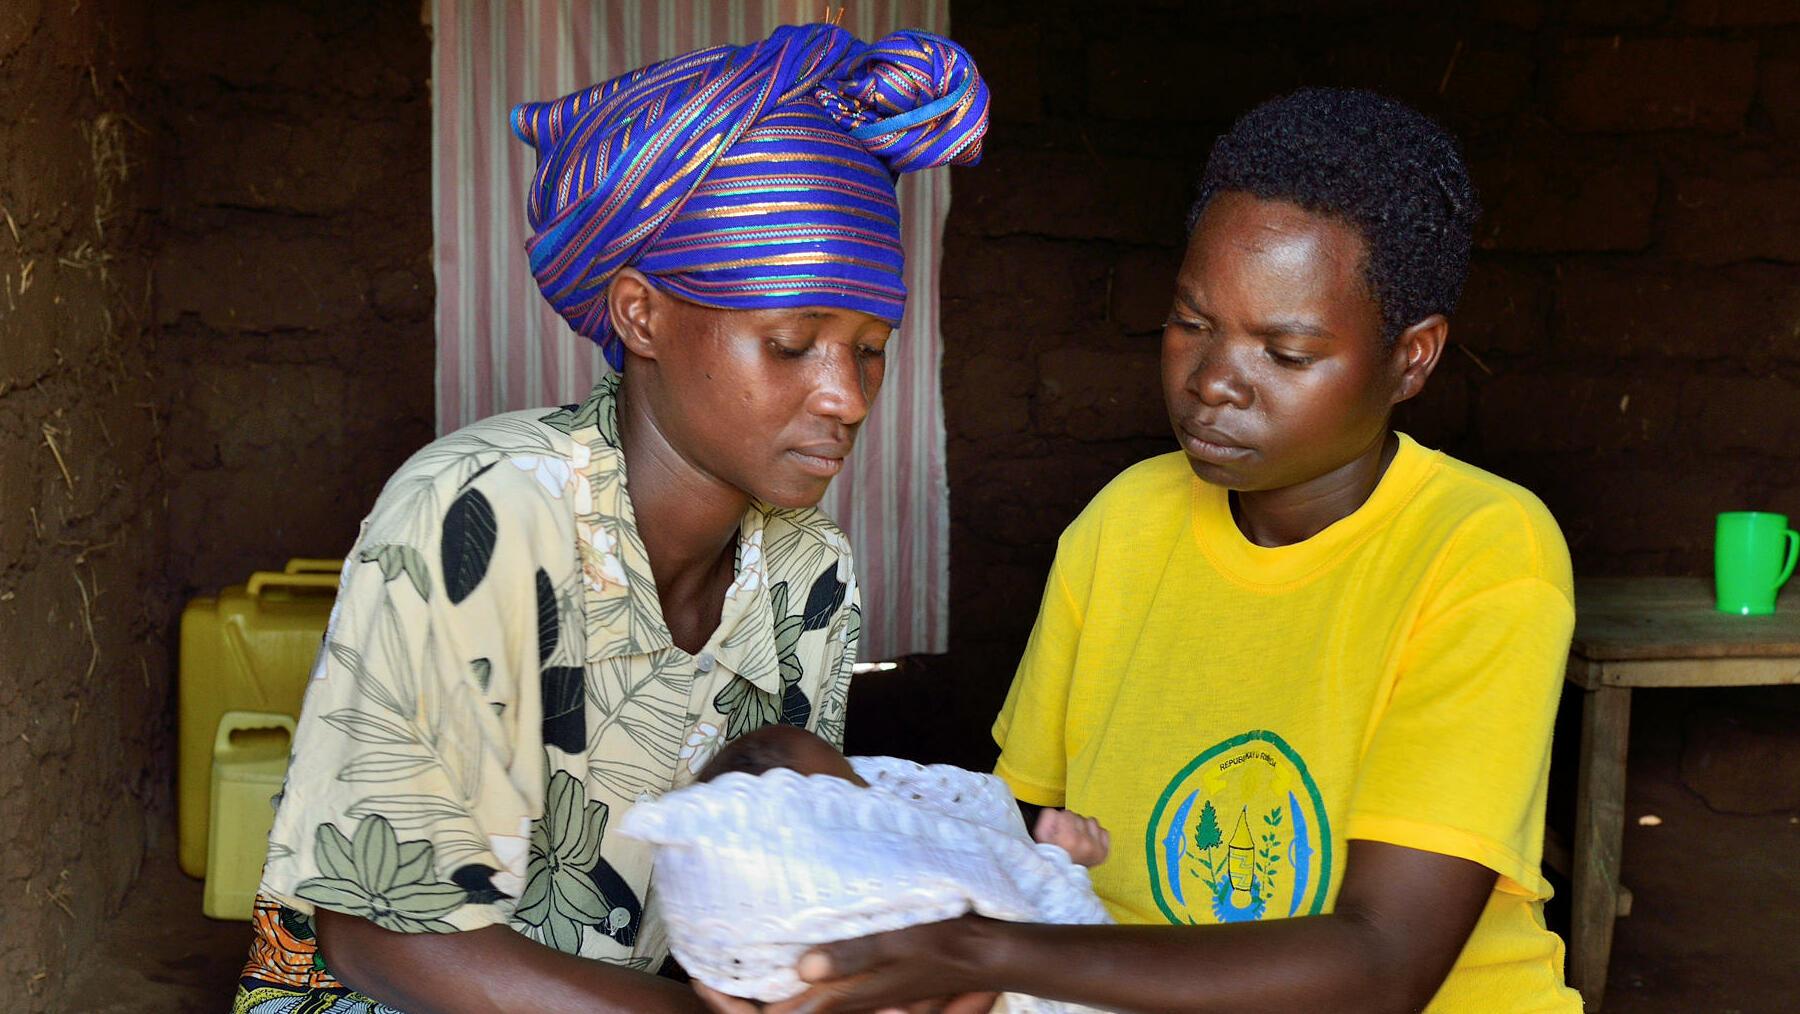 Photo credit: 2013 Todd Shapera, Rwanda, Courtesy of Photoshare